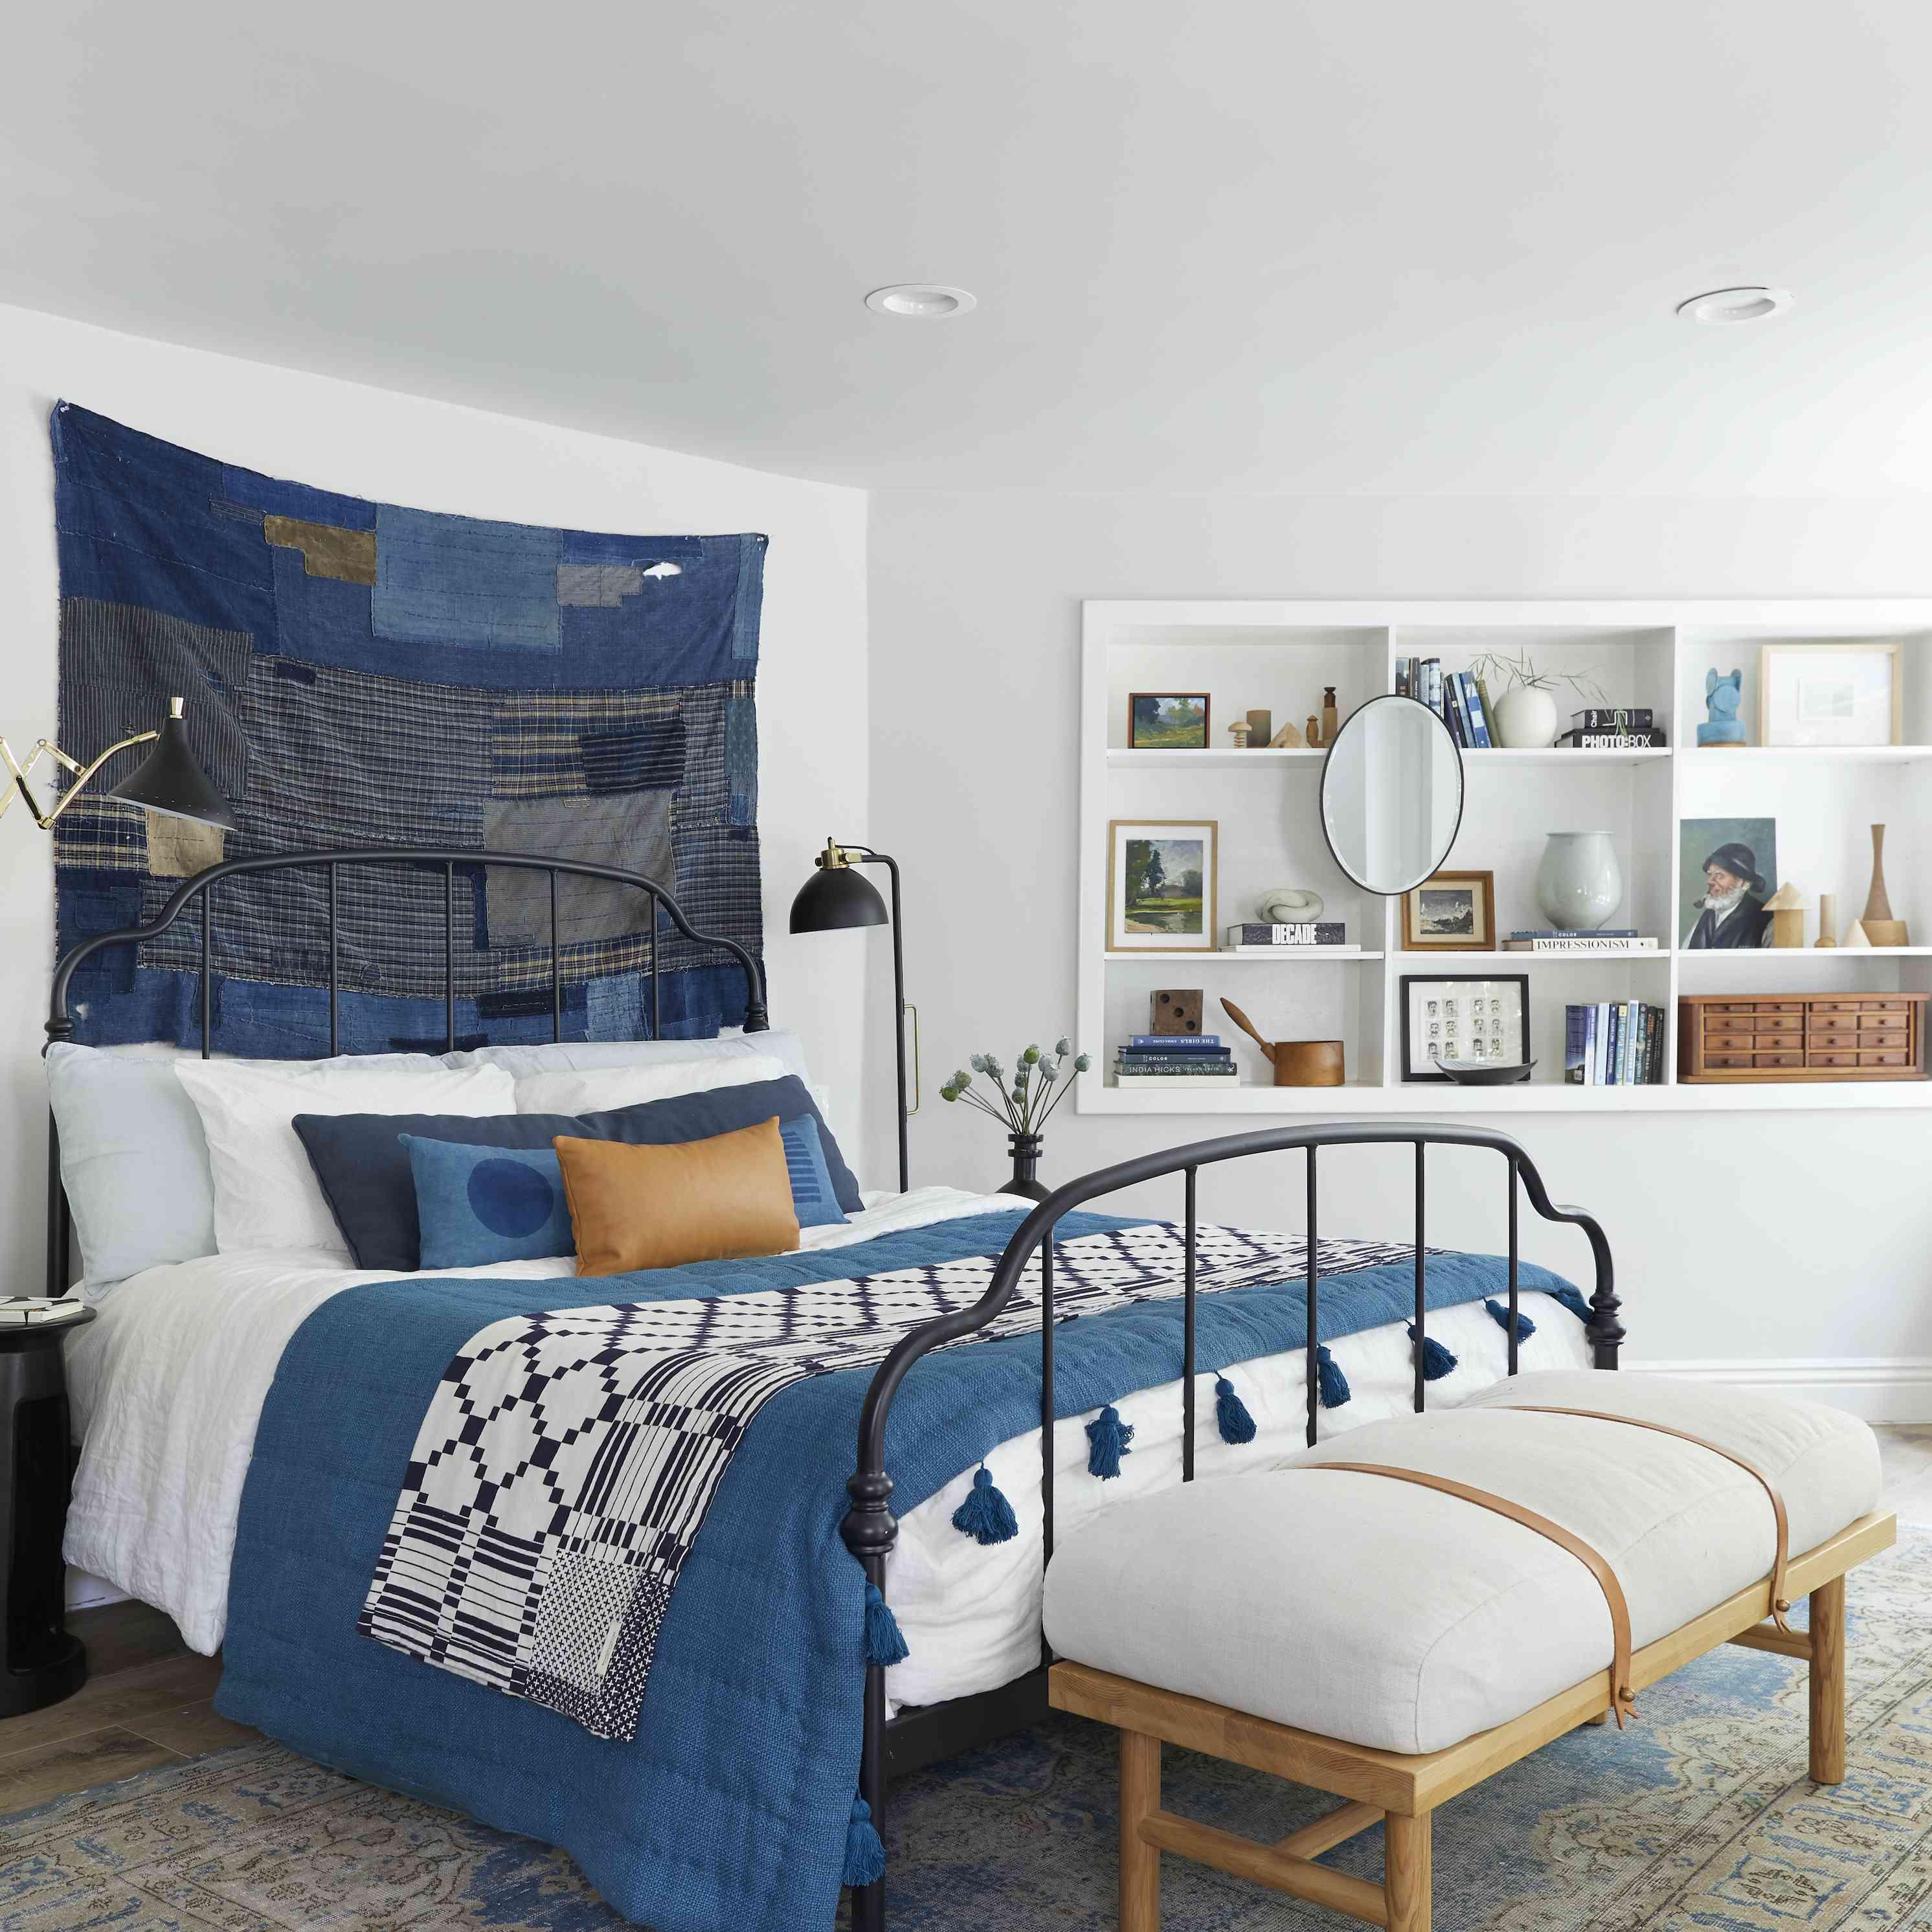 Bedroom in shades of denim